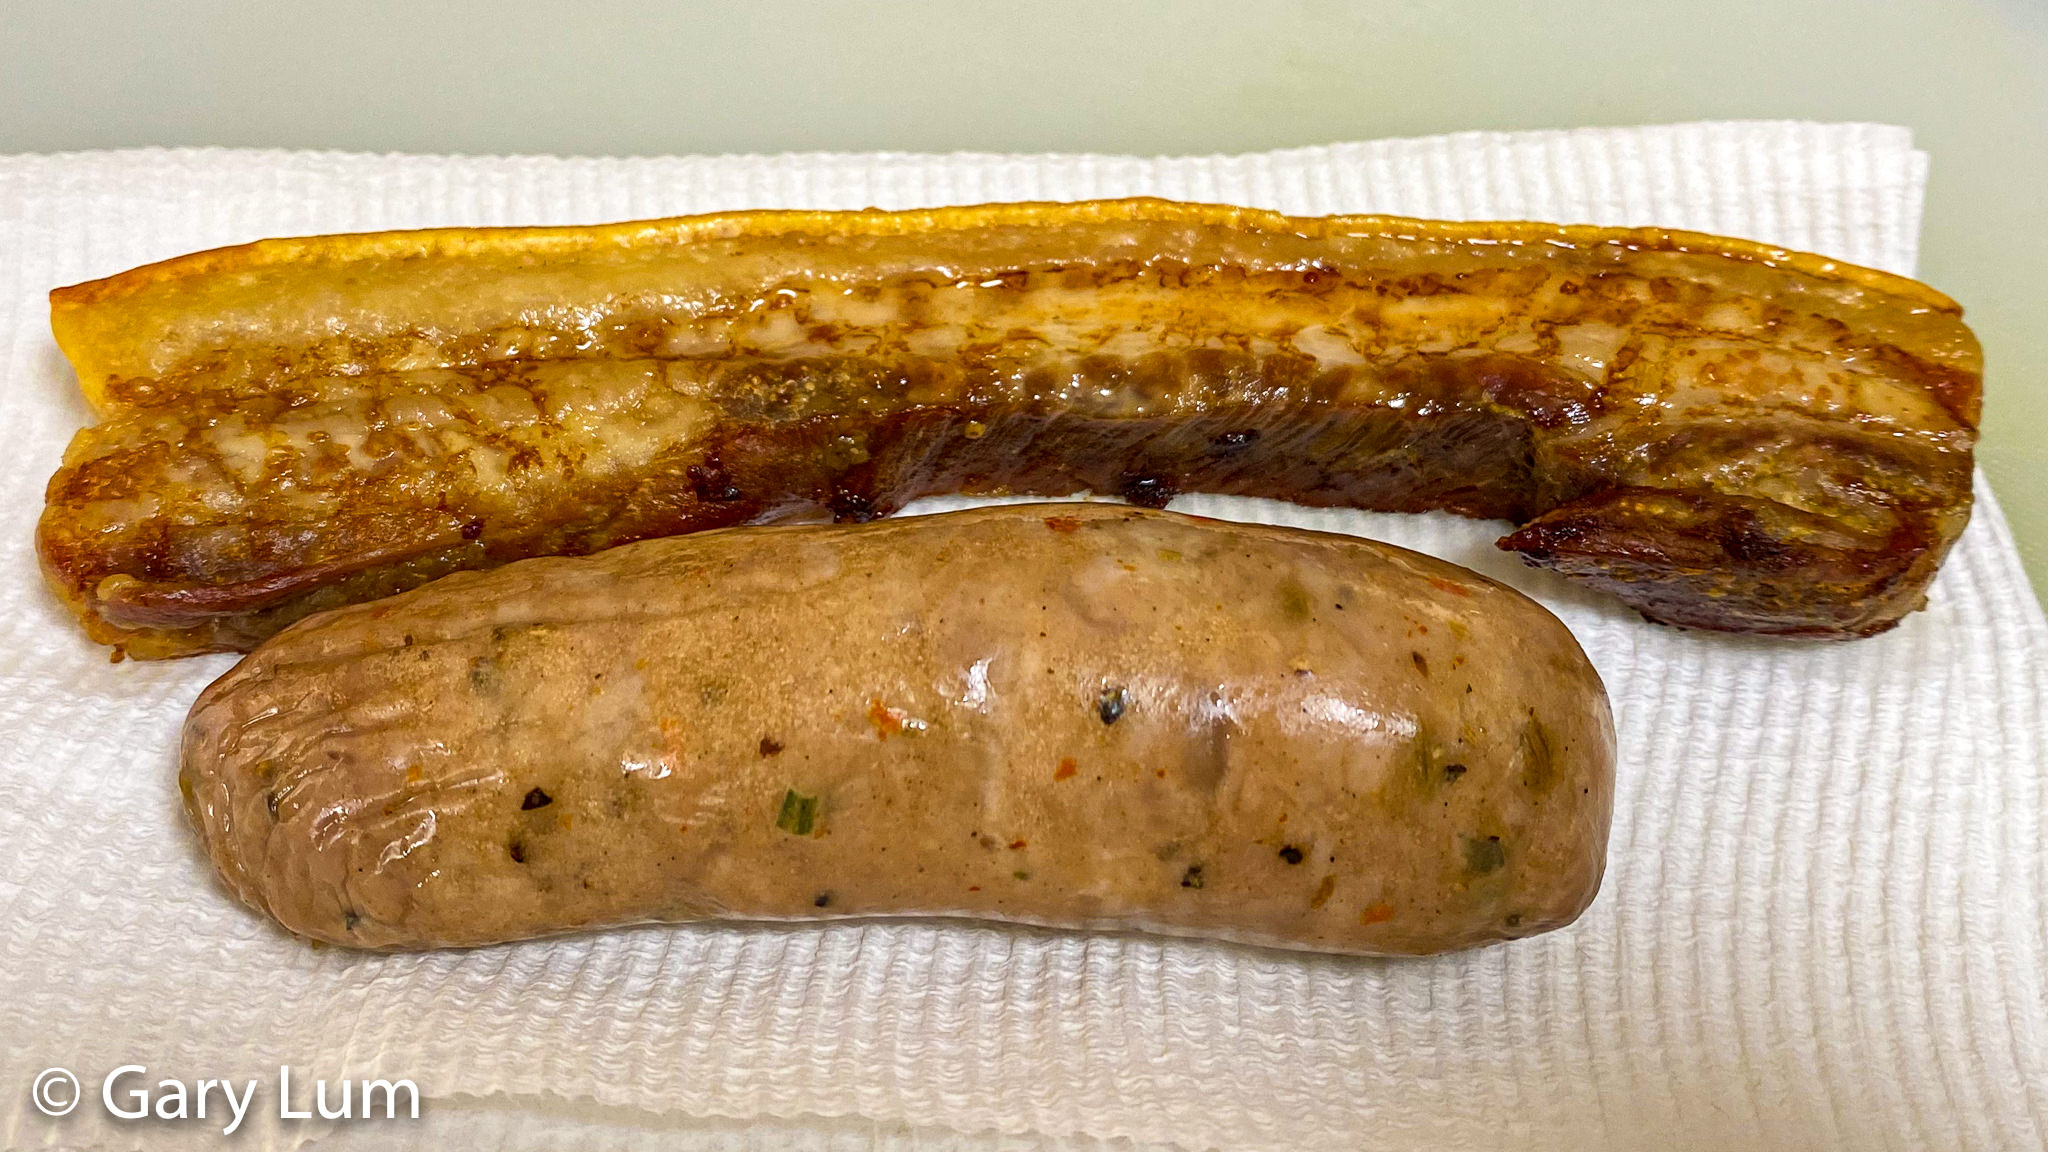 Cooked pork rasher and pork sausage. Gary Lum.